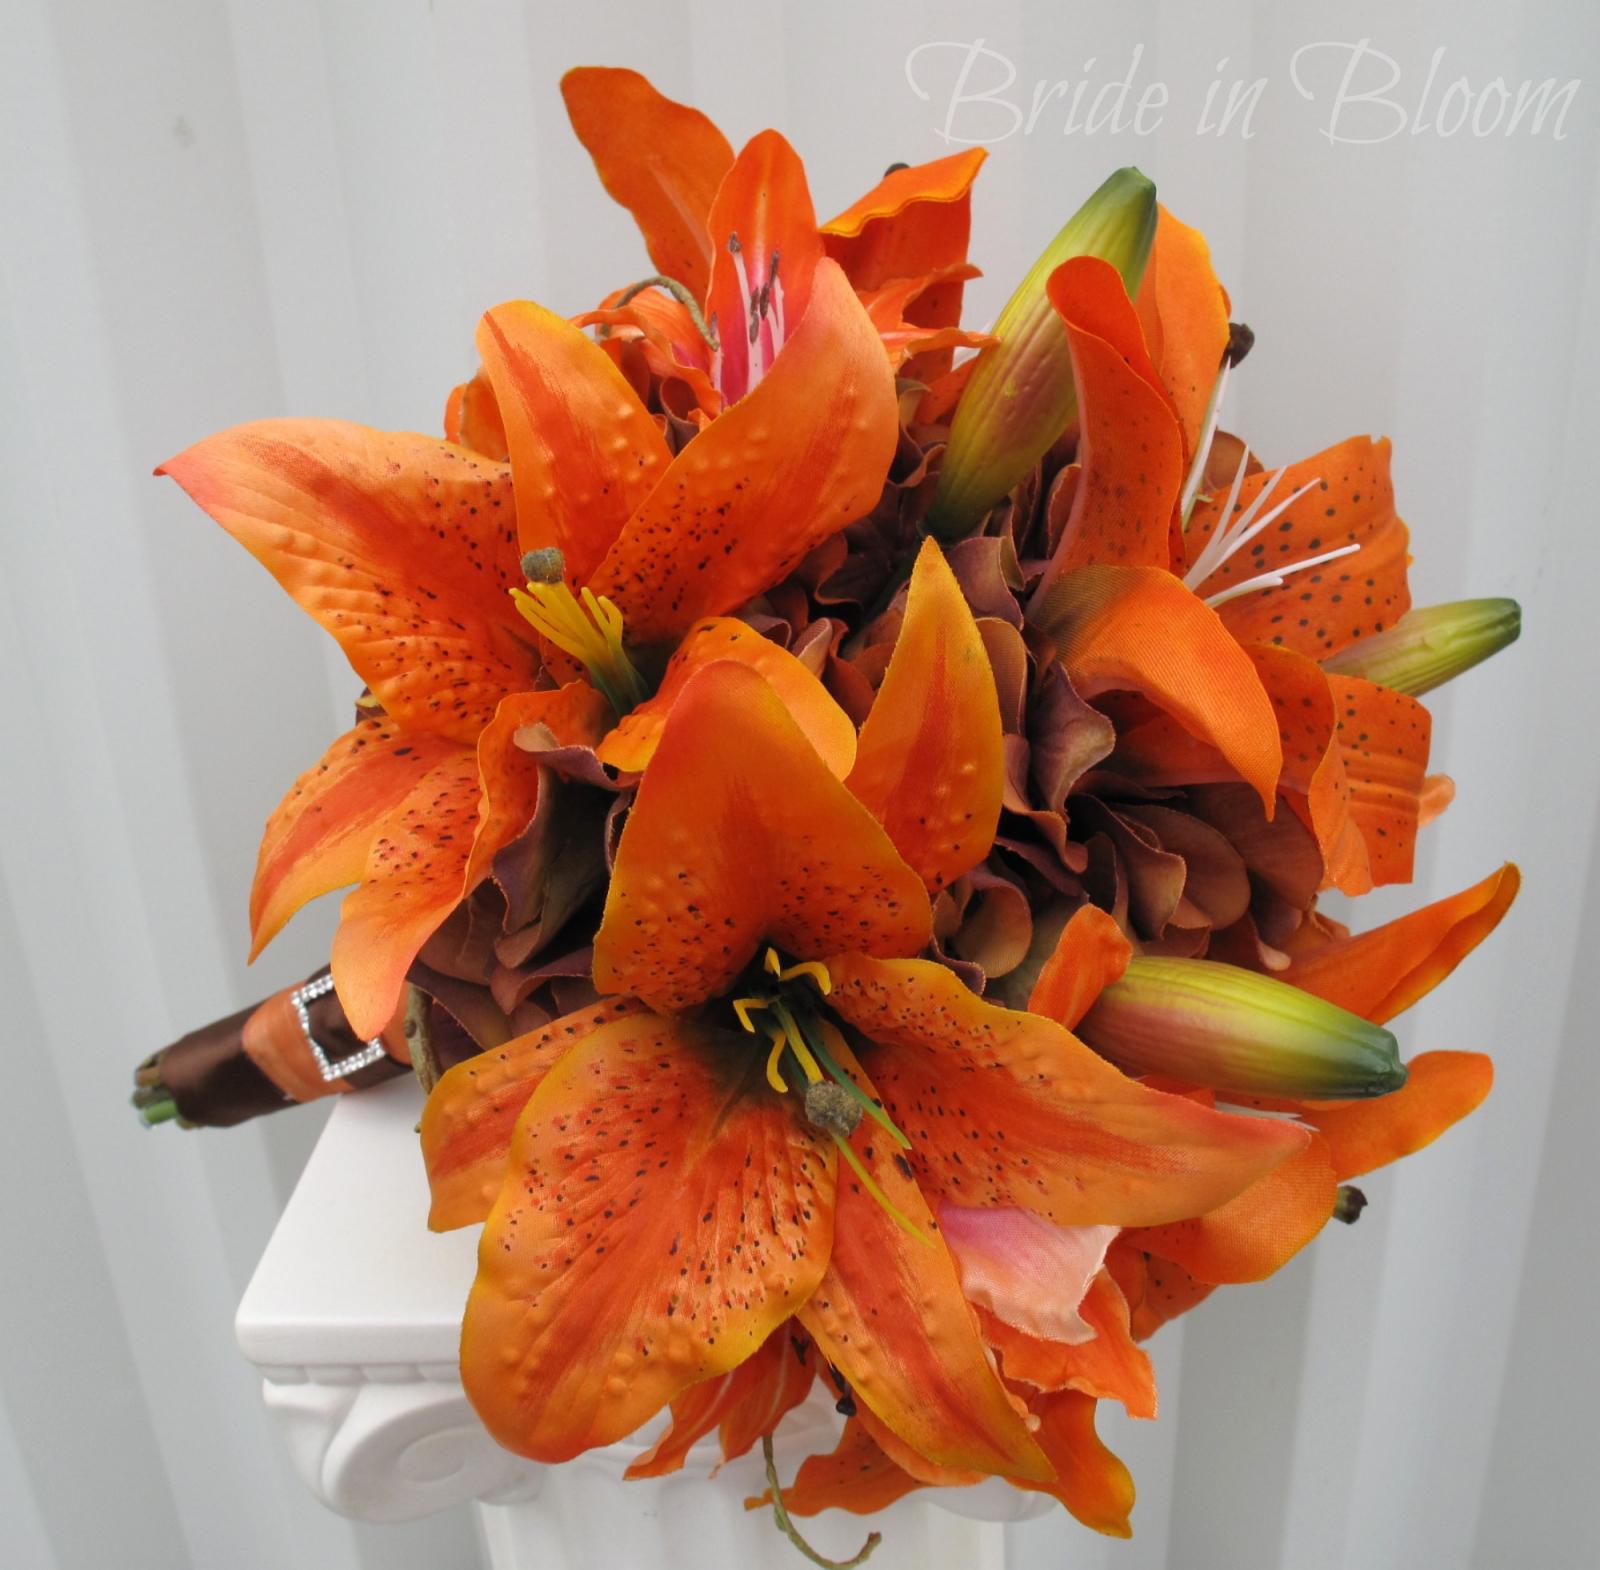 Tiger lily wedding bouquet silk bridal bouquet bride in bloom tiger lily wedding bouquet silk bridal bouquet izmirmasajfo